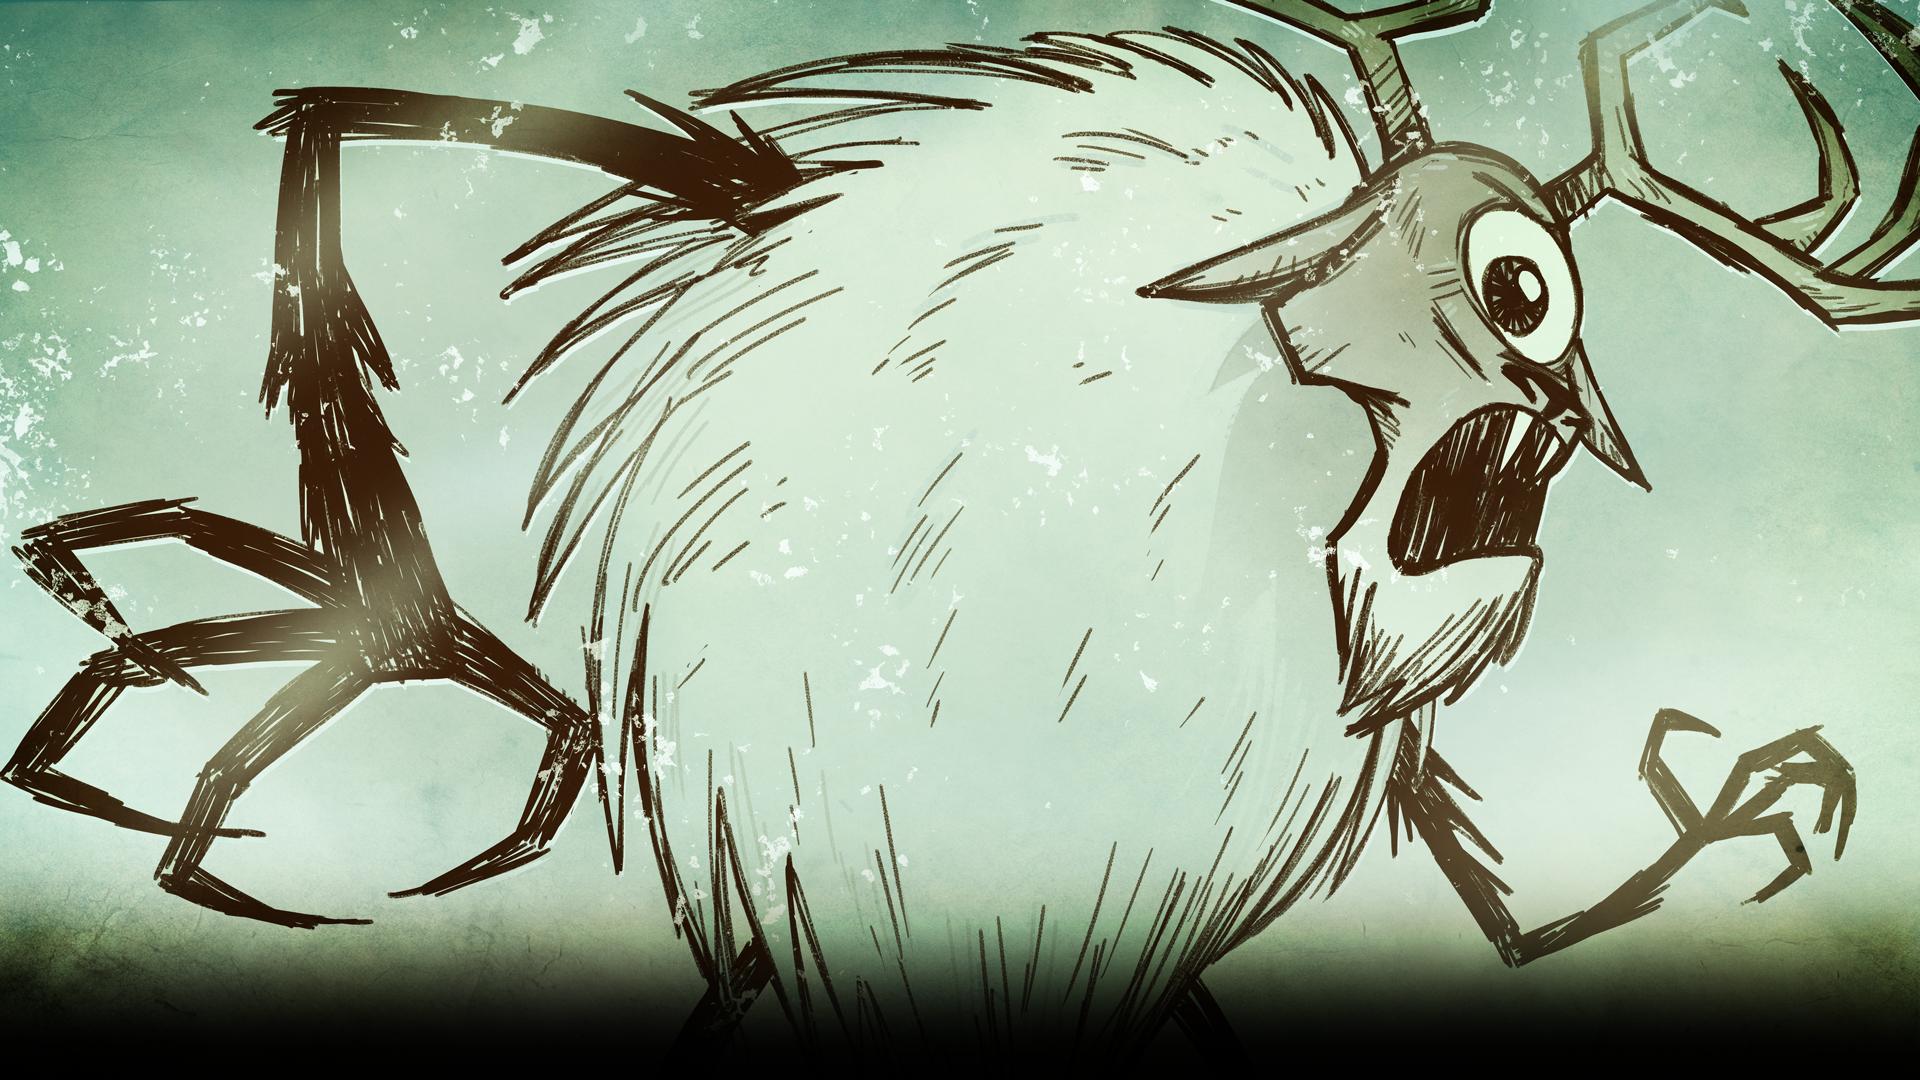 Don't Starve Background Deerclops.png